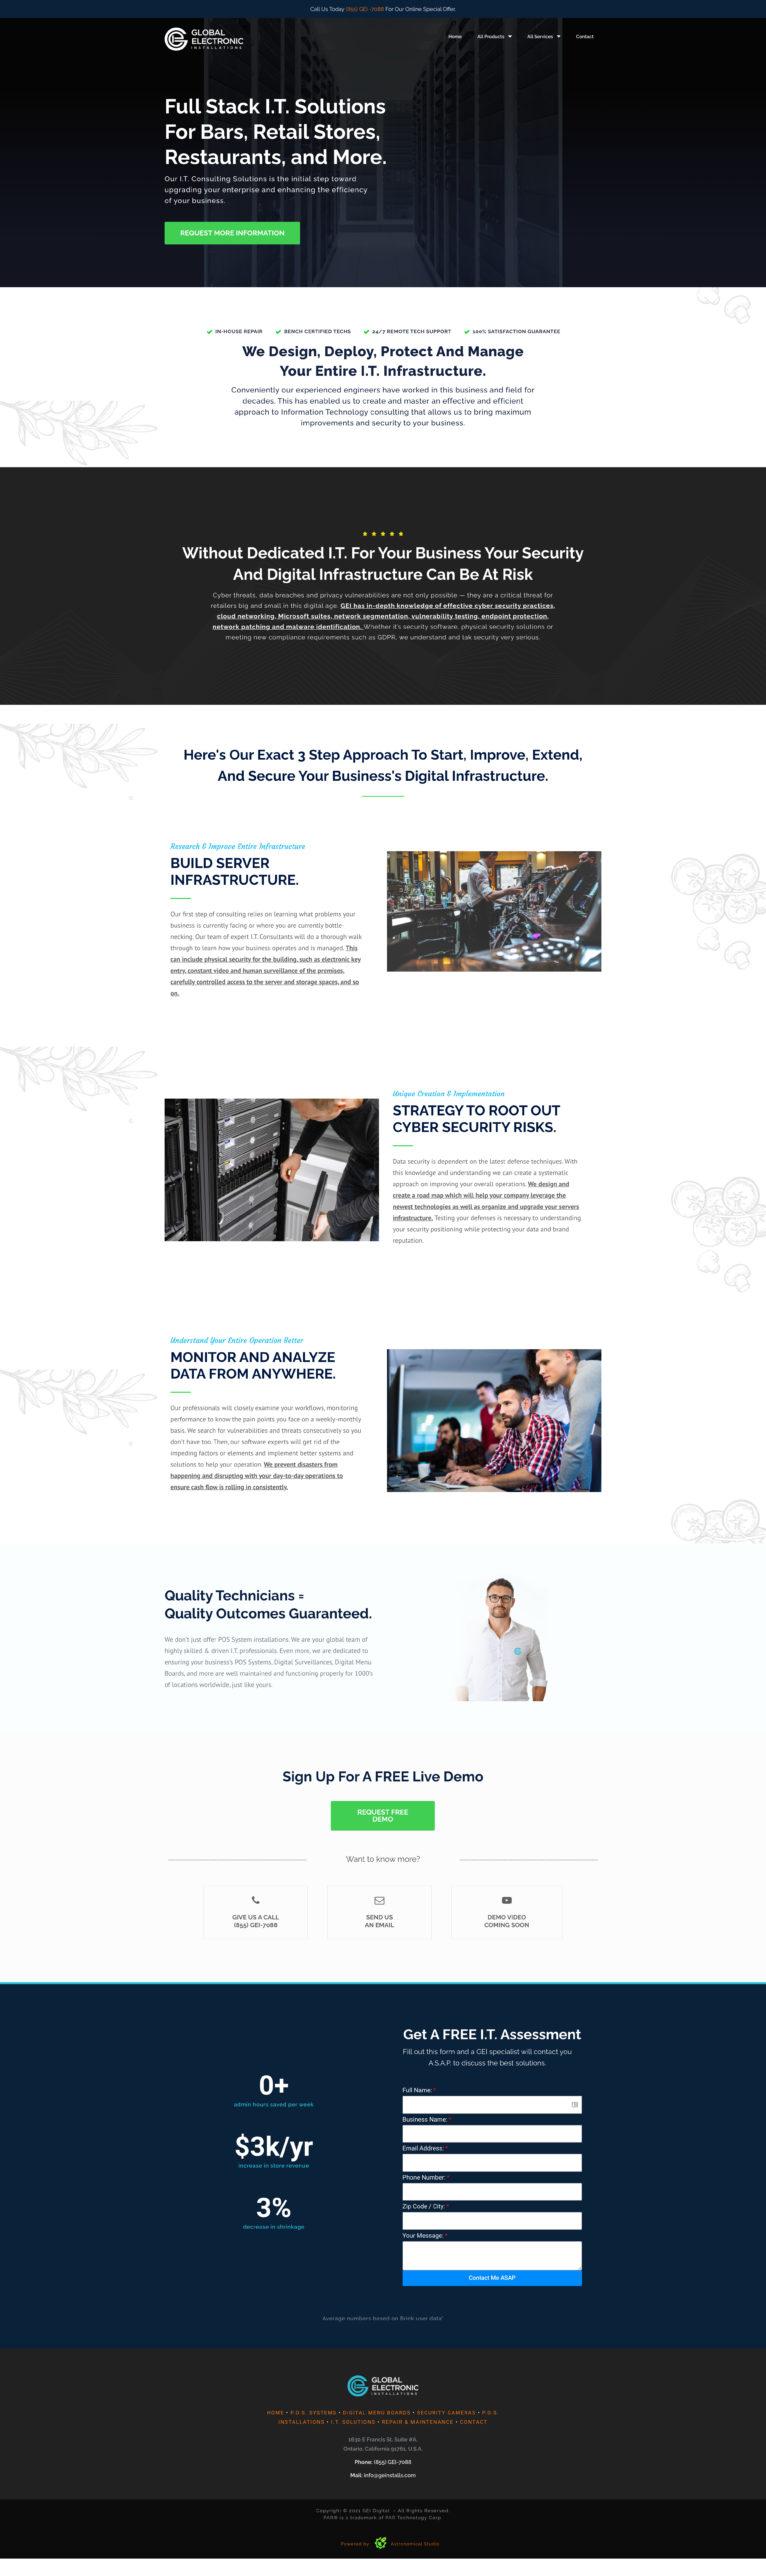 GEI-Digital-IT-Solutions-Website-Design-By-Astronomical-Studio